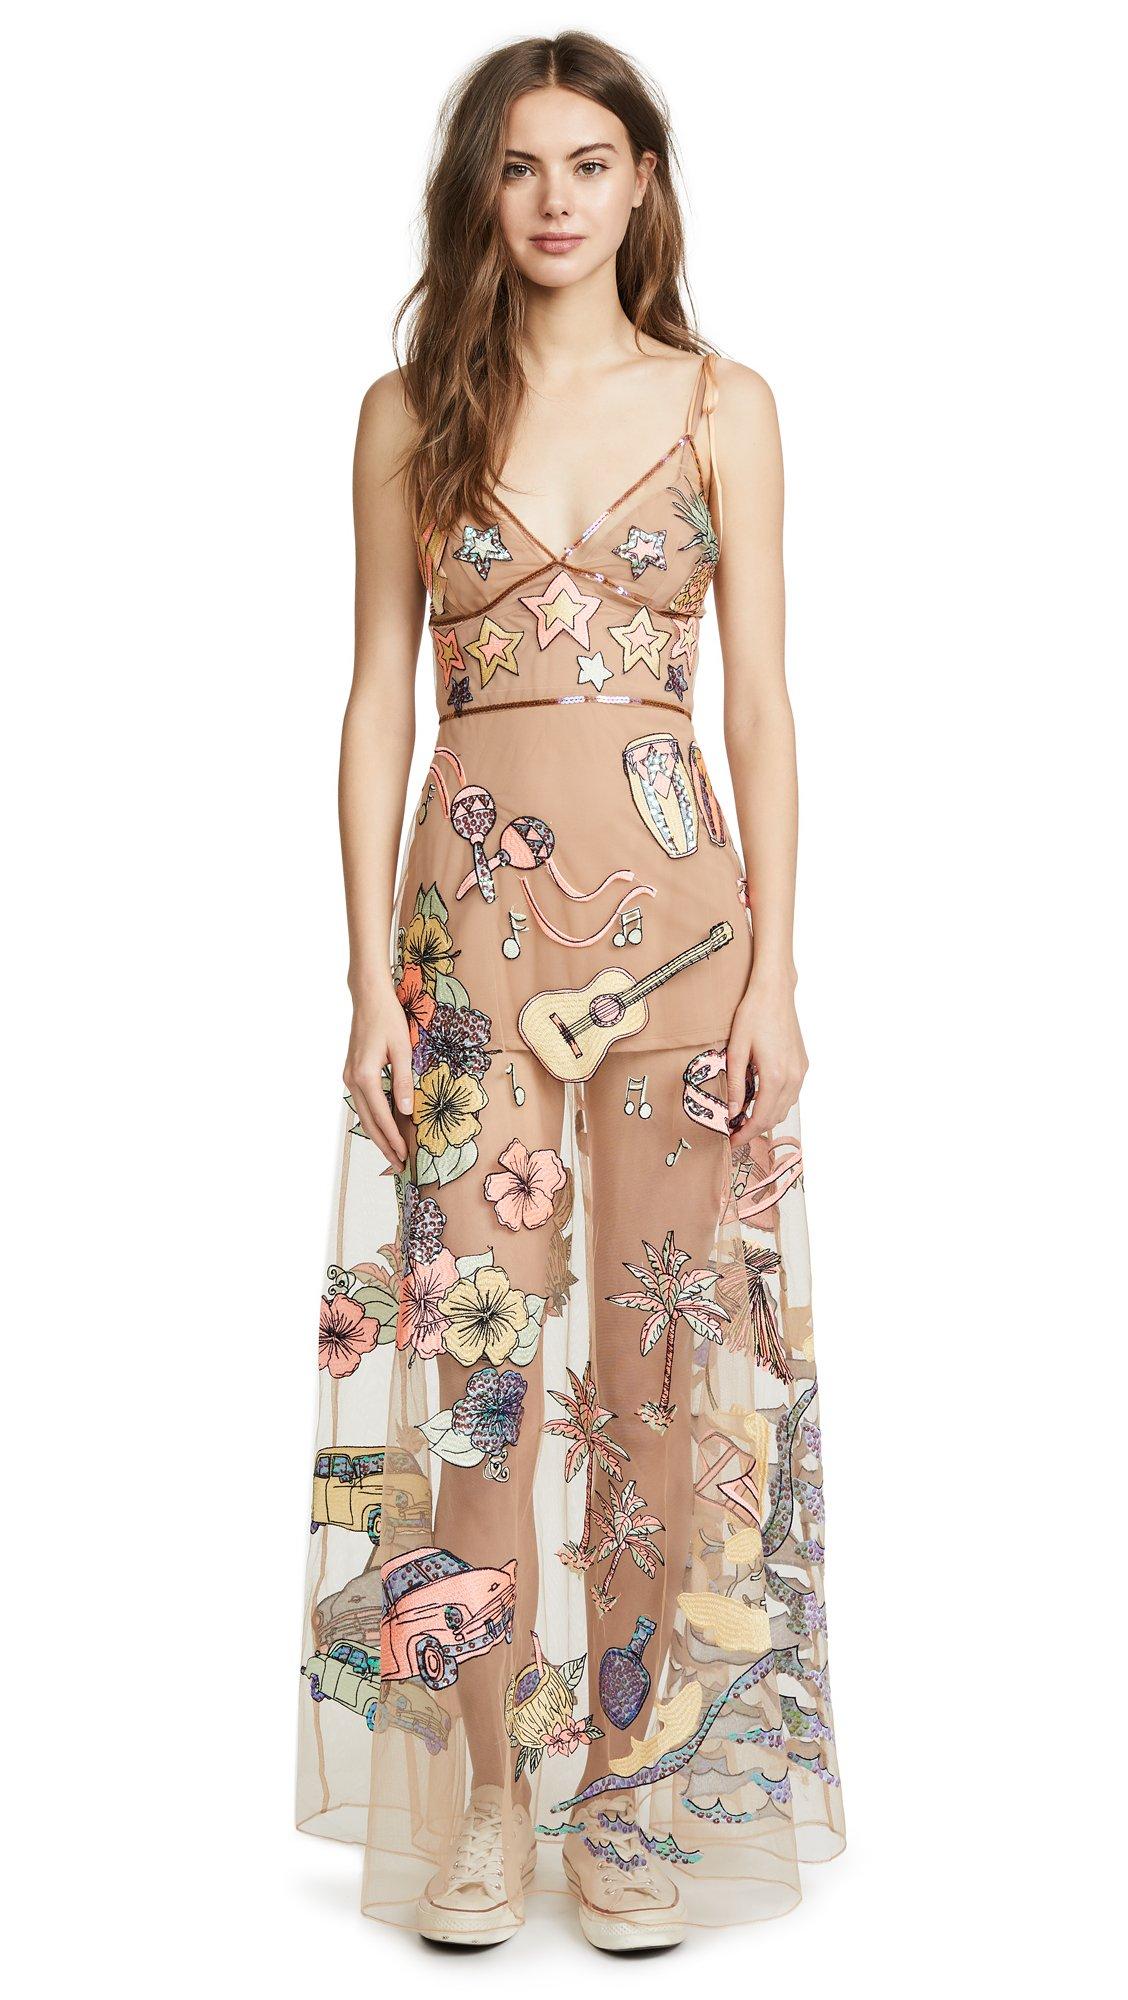 For Love & Lemons Women's Cuba Embroidery Sequin Dress, Parrot, S